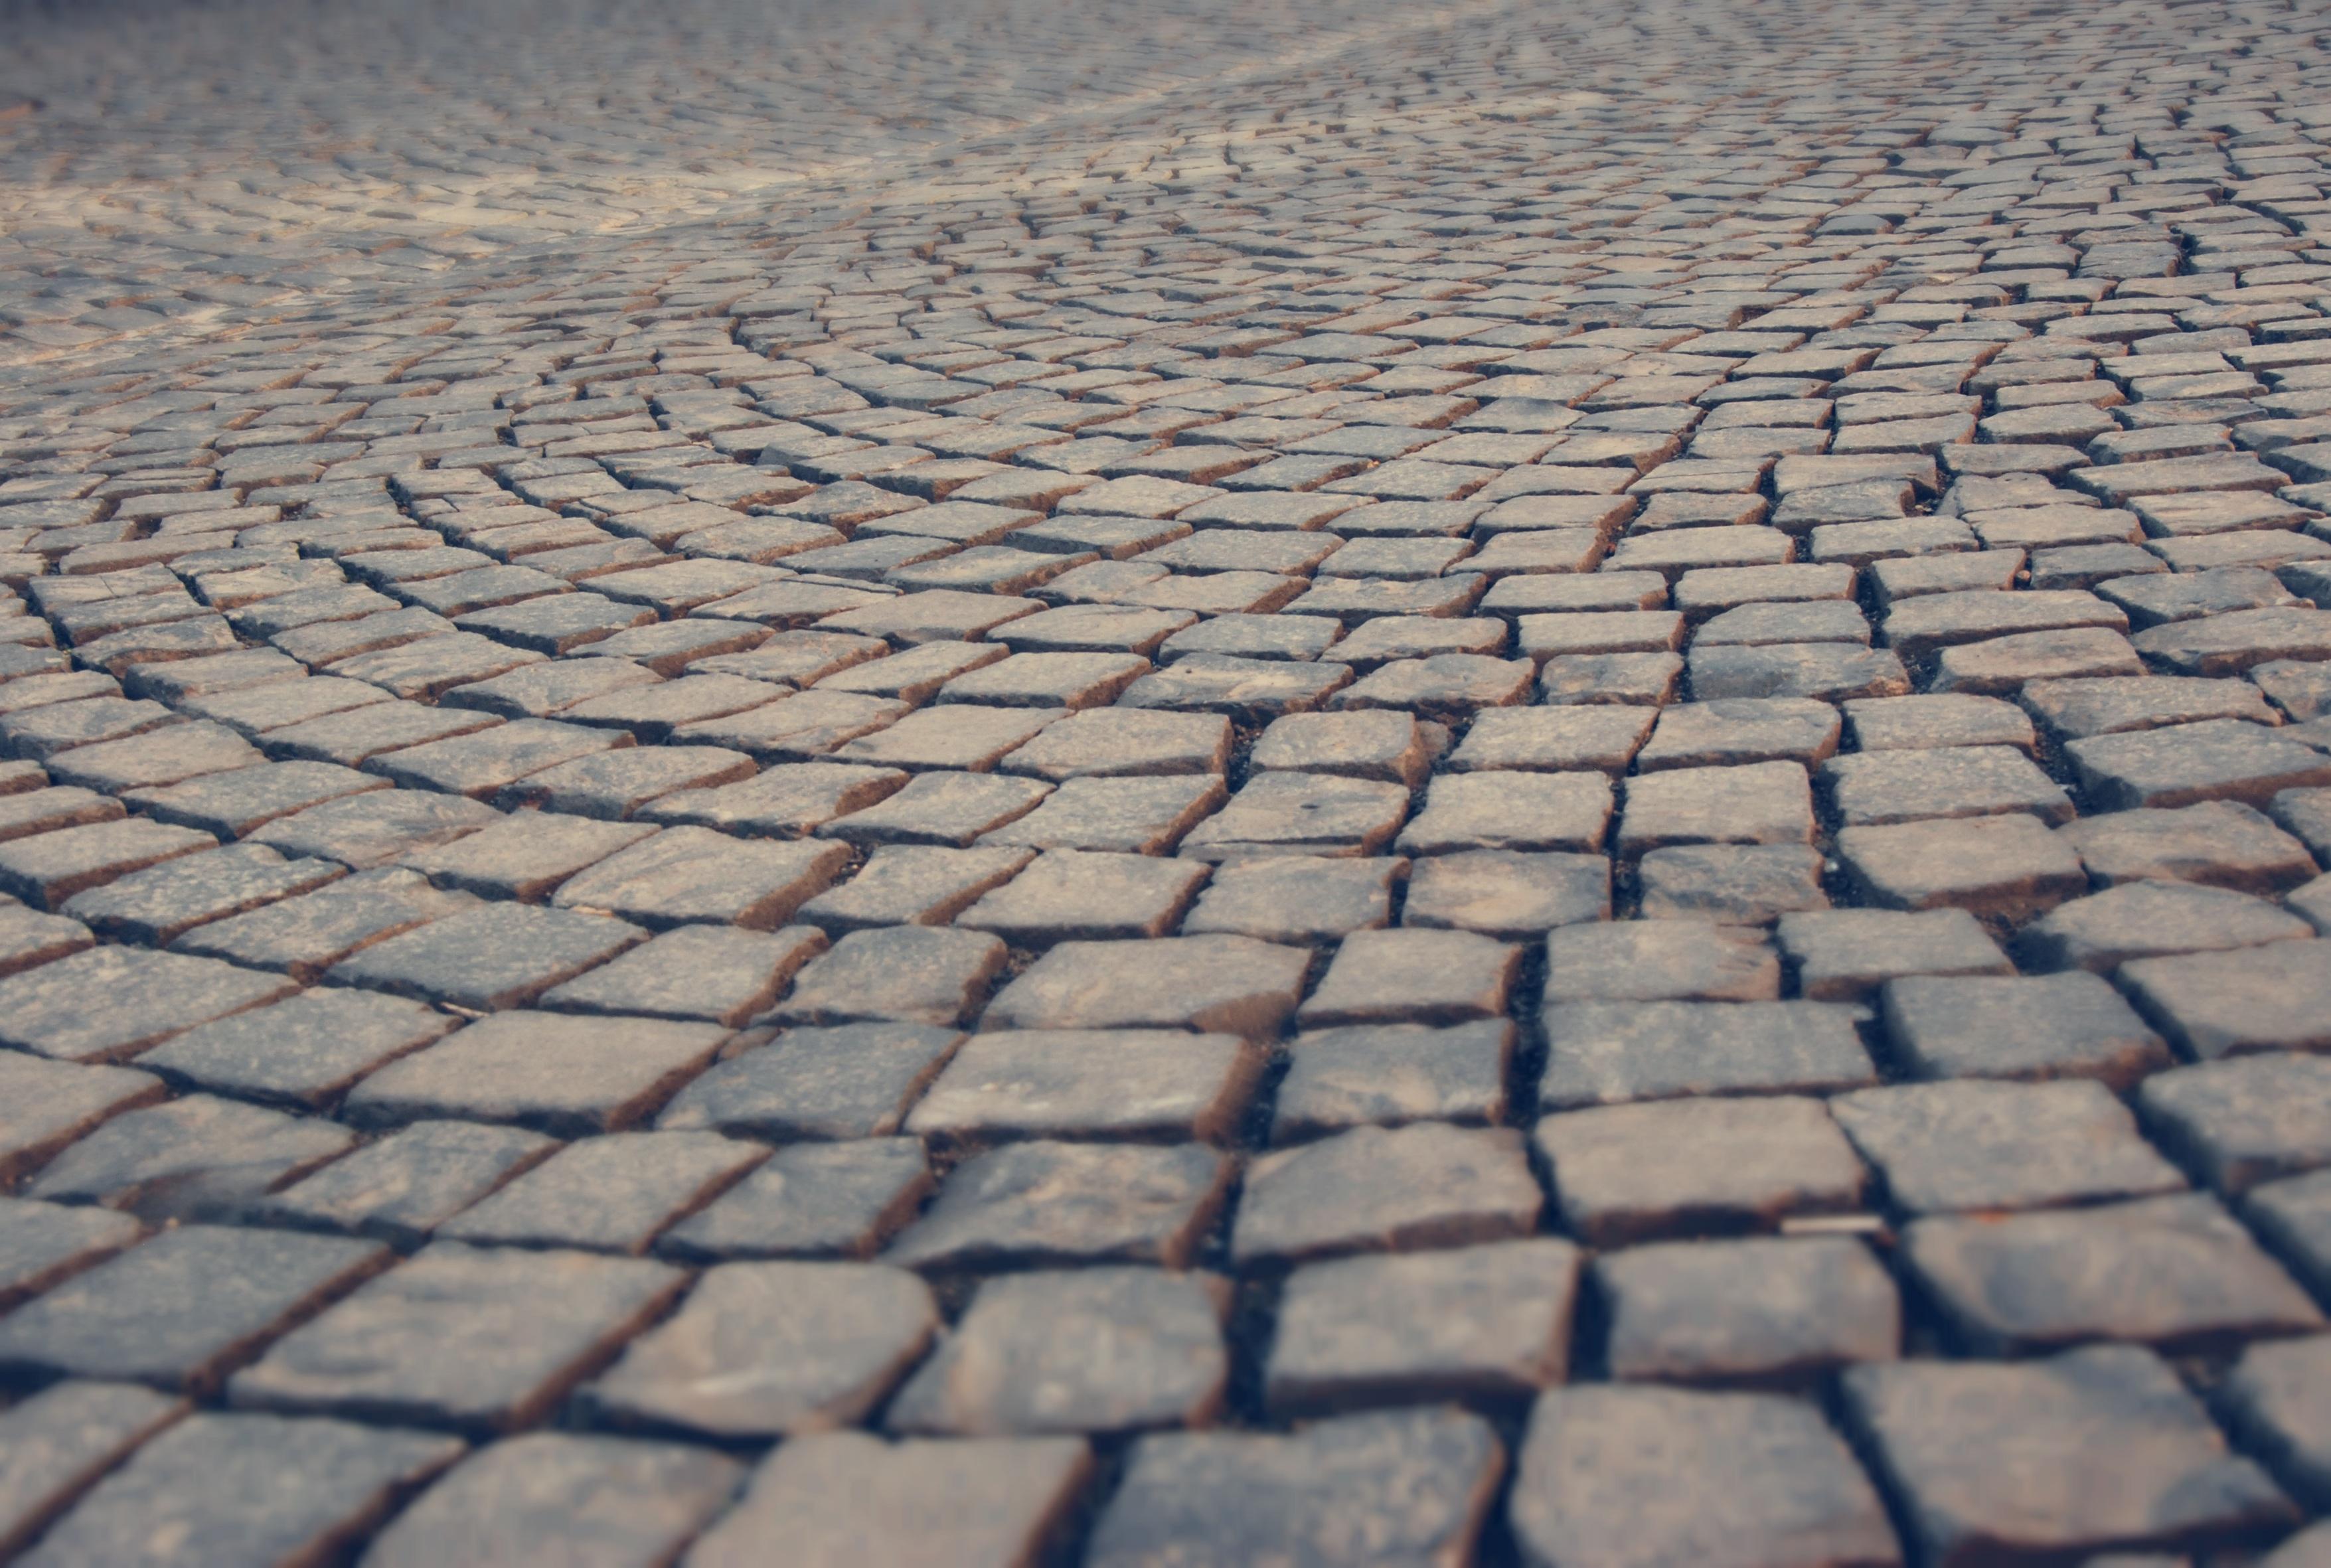 fotos gratis la carretera suelo textura acera piso techo guijarro asfalto pavimento pasarela azul ladrillo material parche piedras mosaico